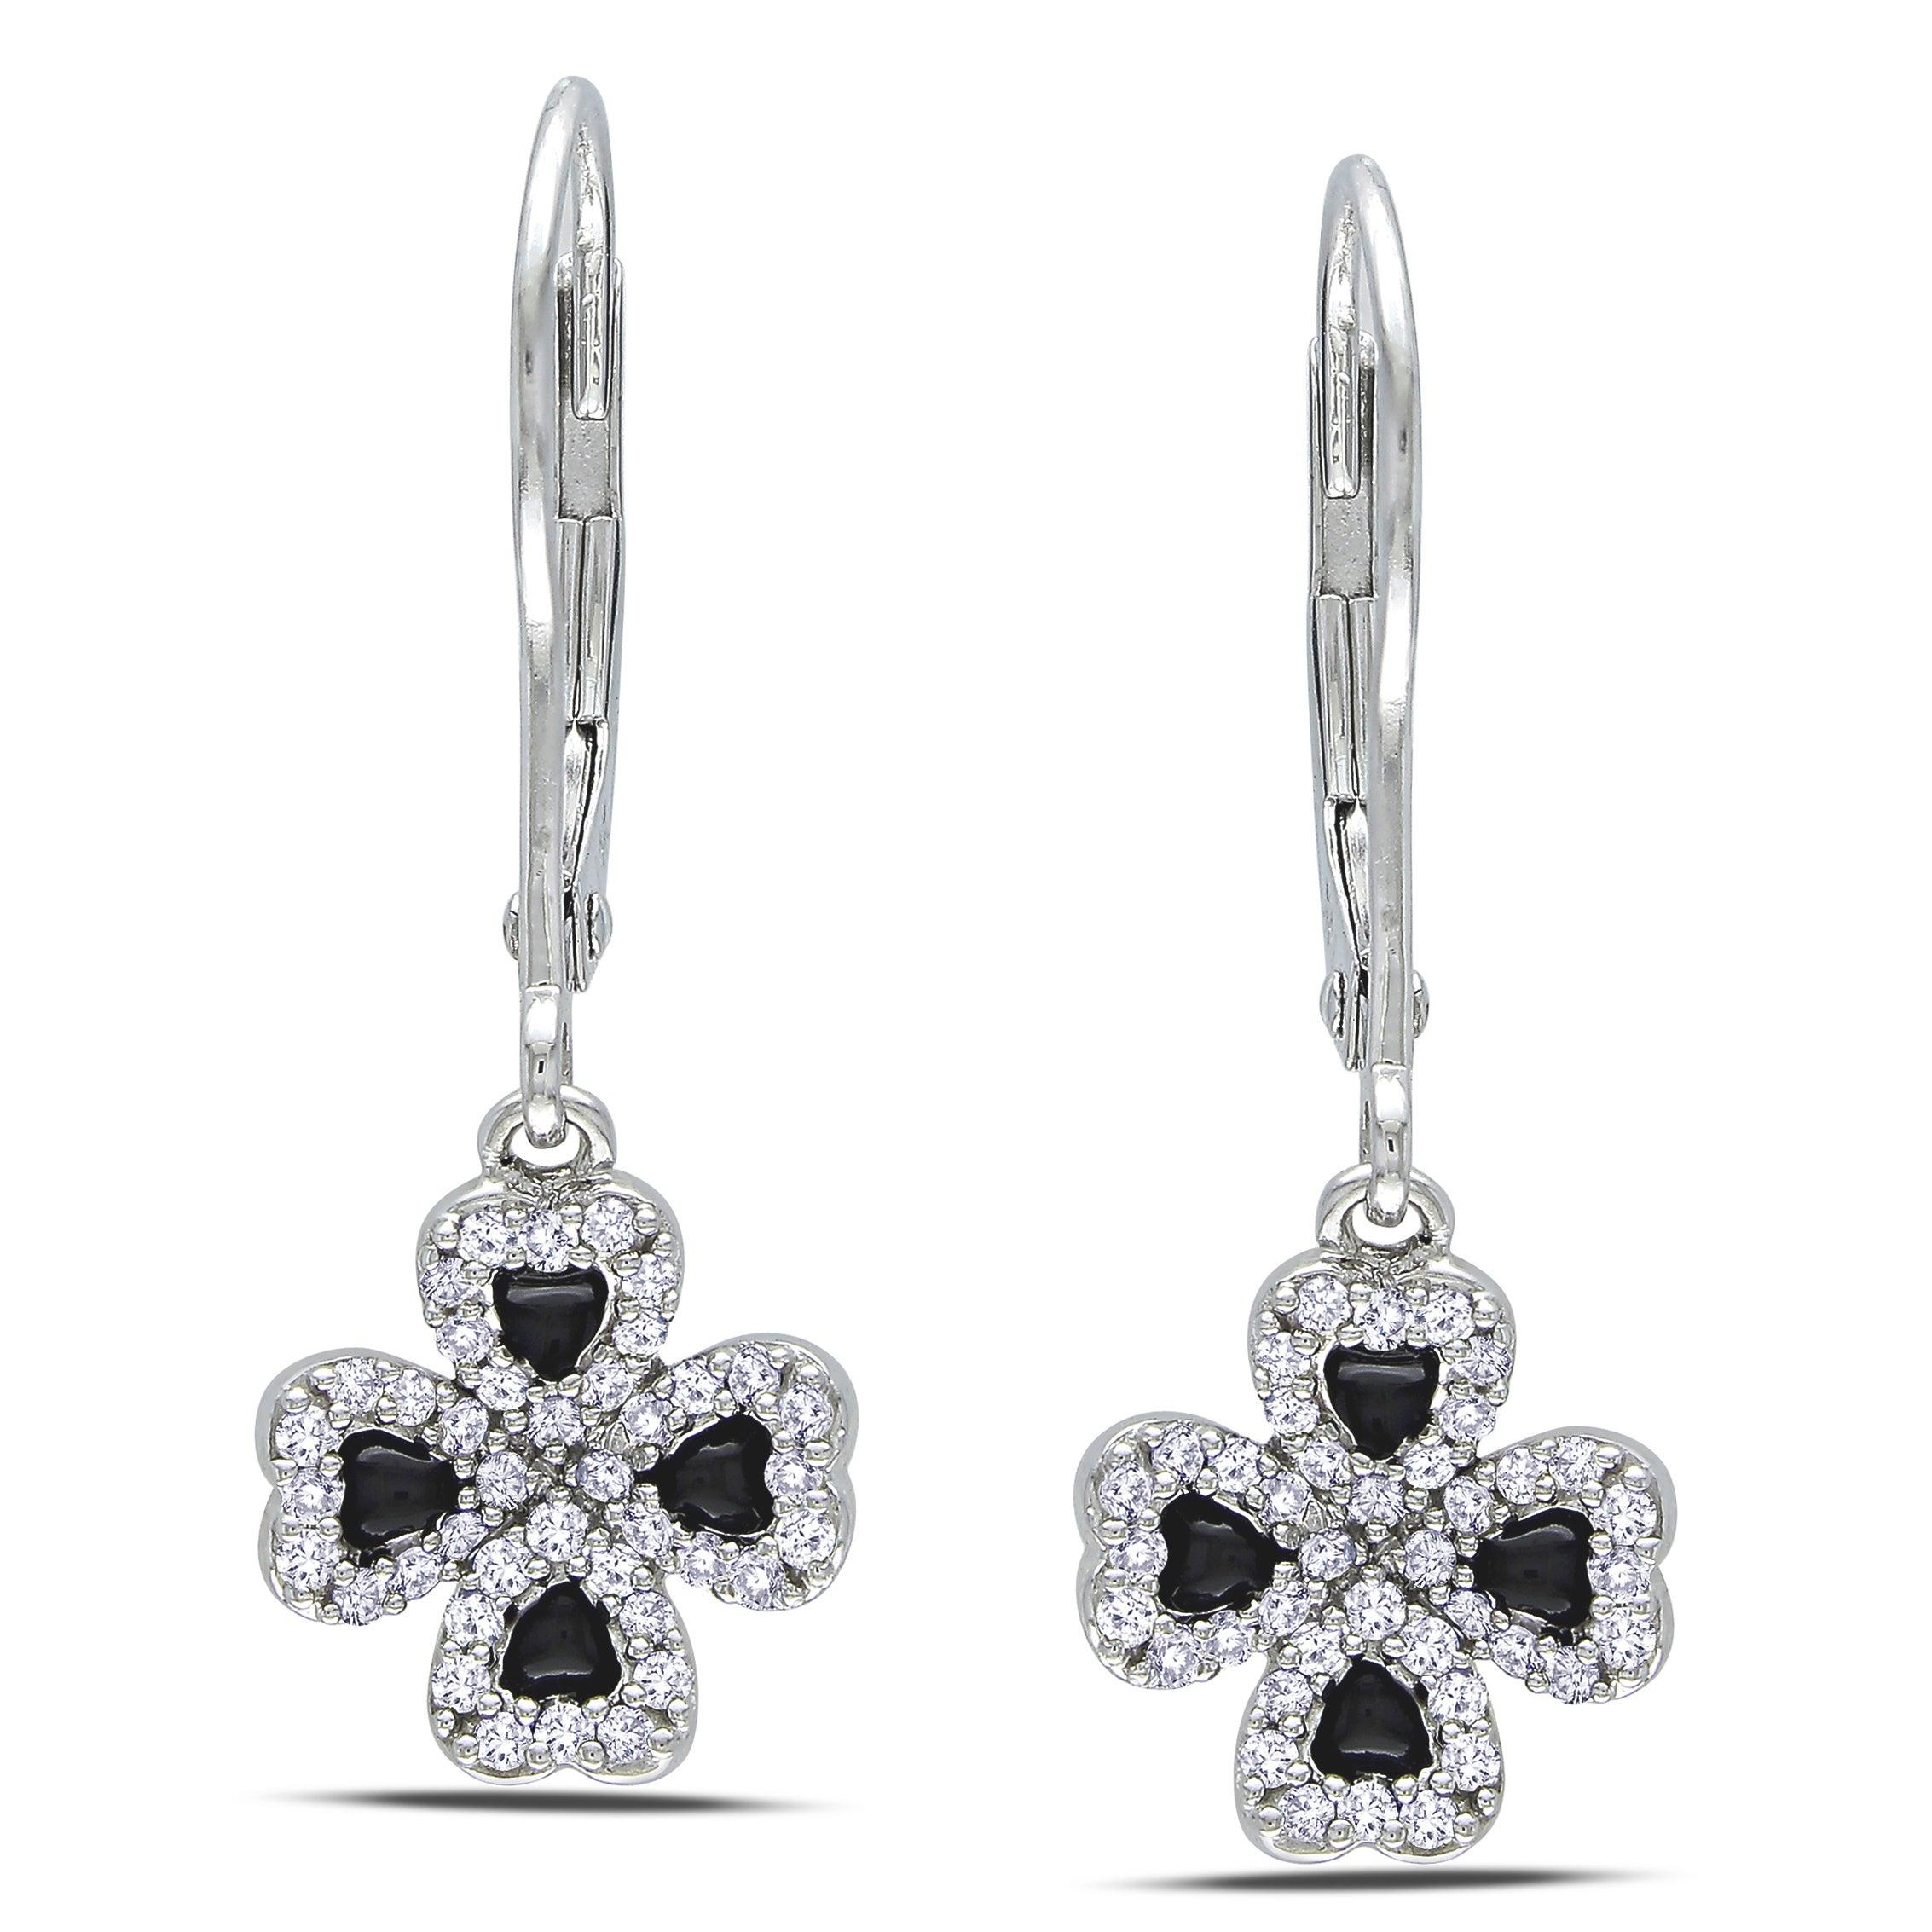 Miadora 14k Gold 1/4ct Black Enamel Four Leaf Clover Diamond Earrings